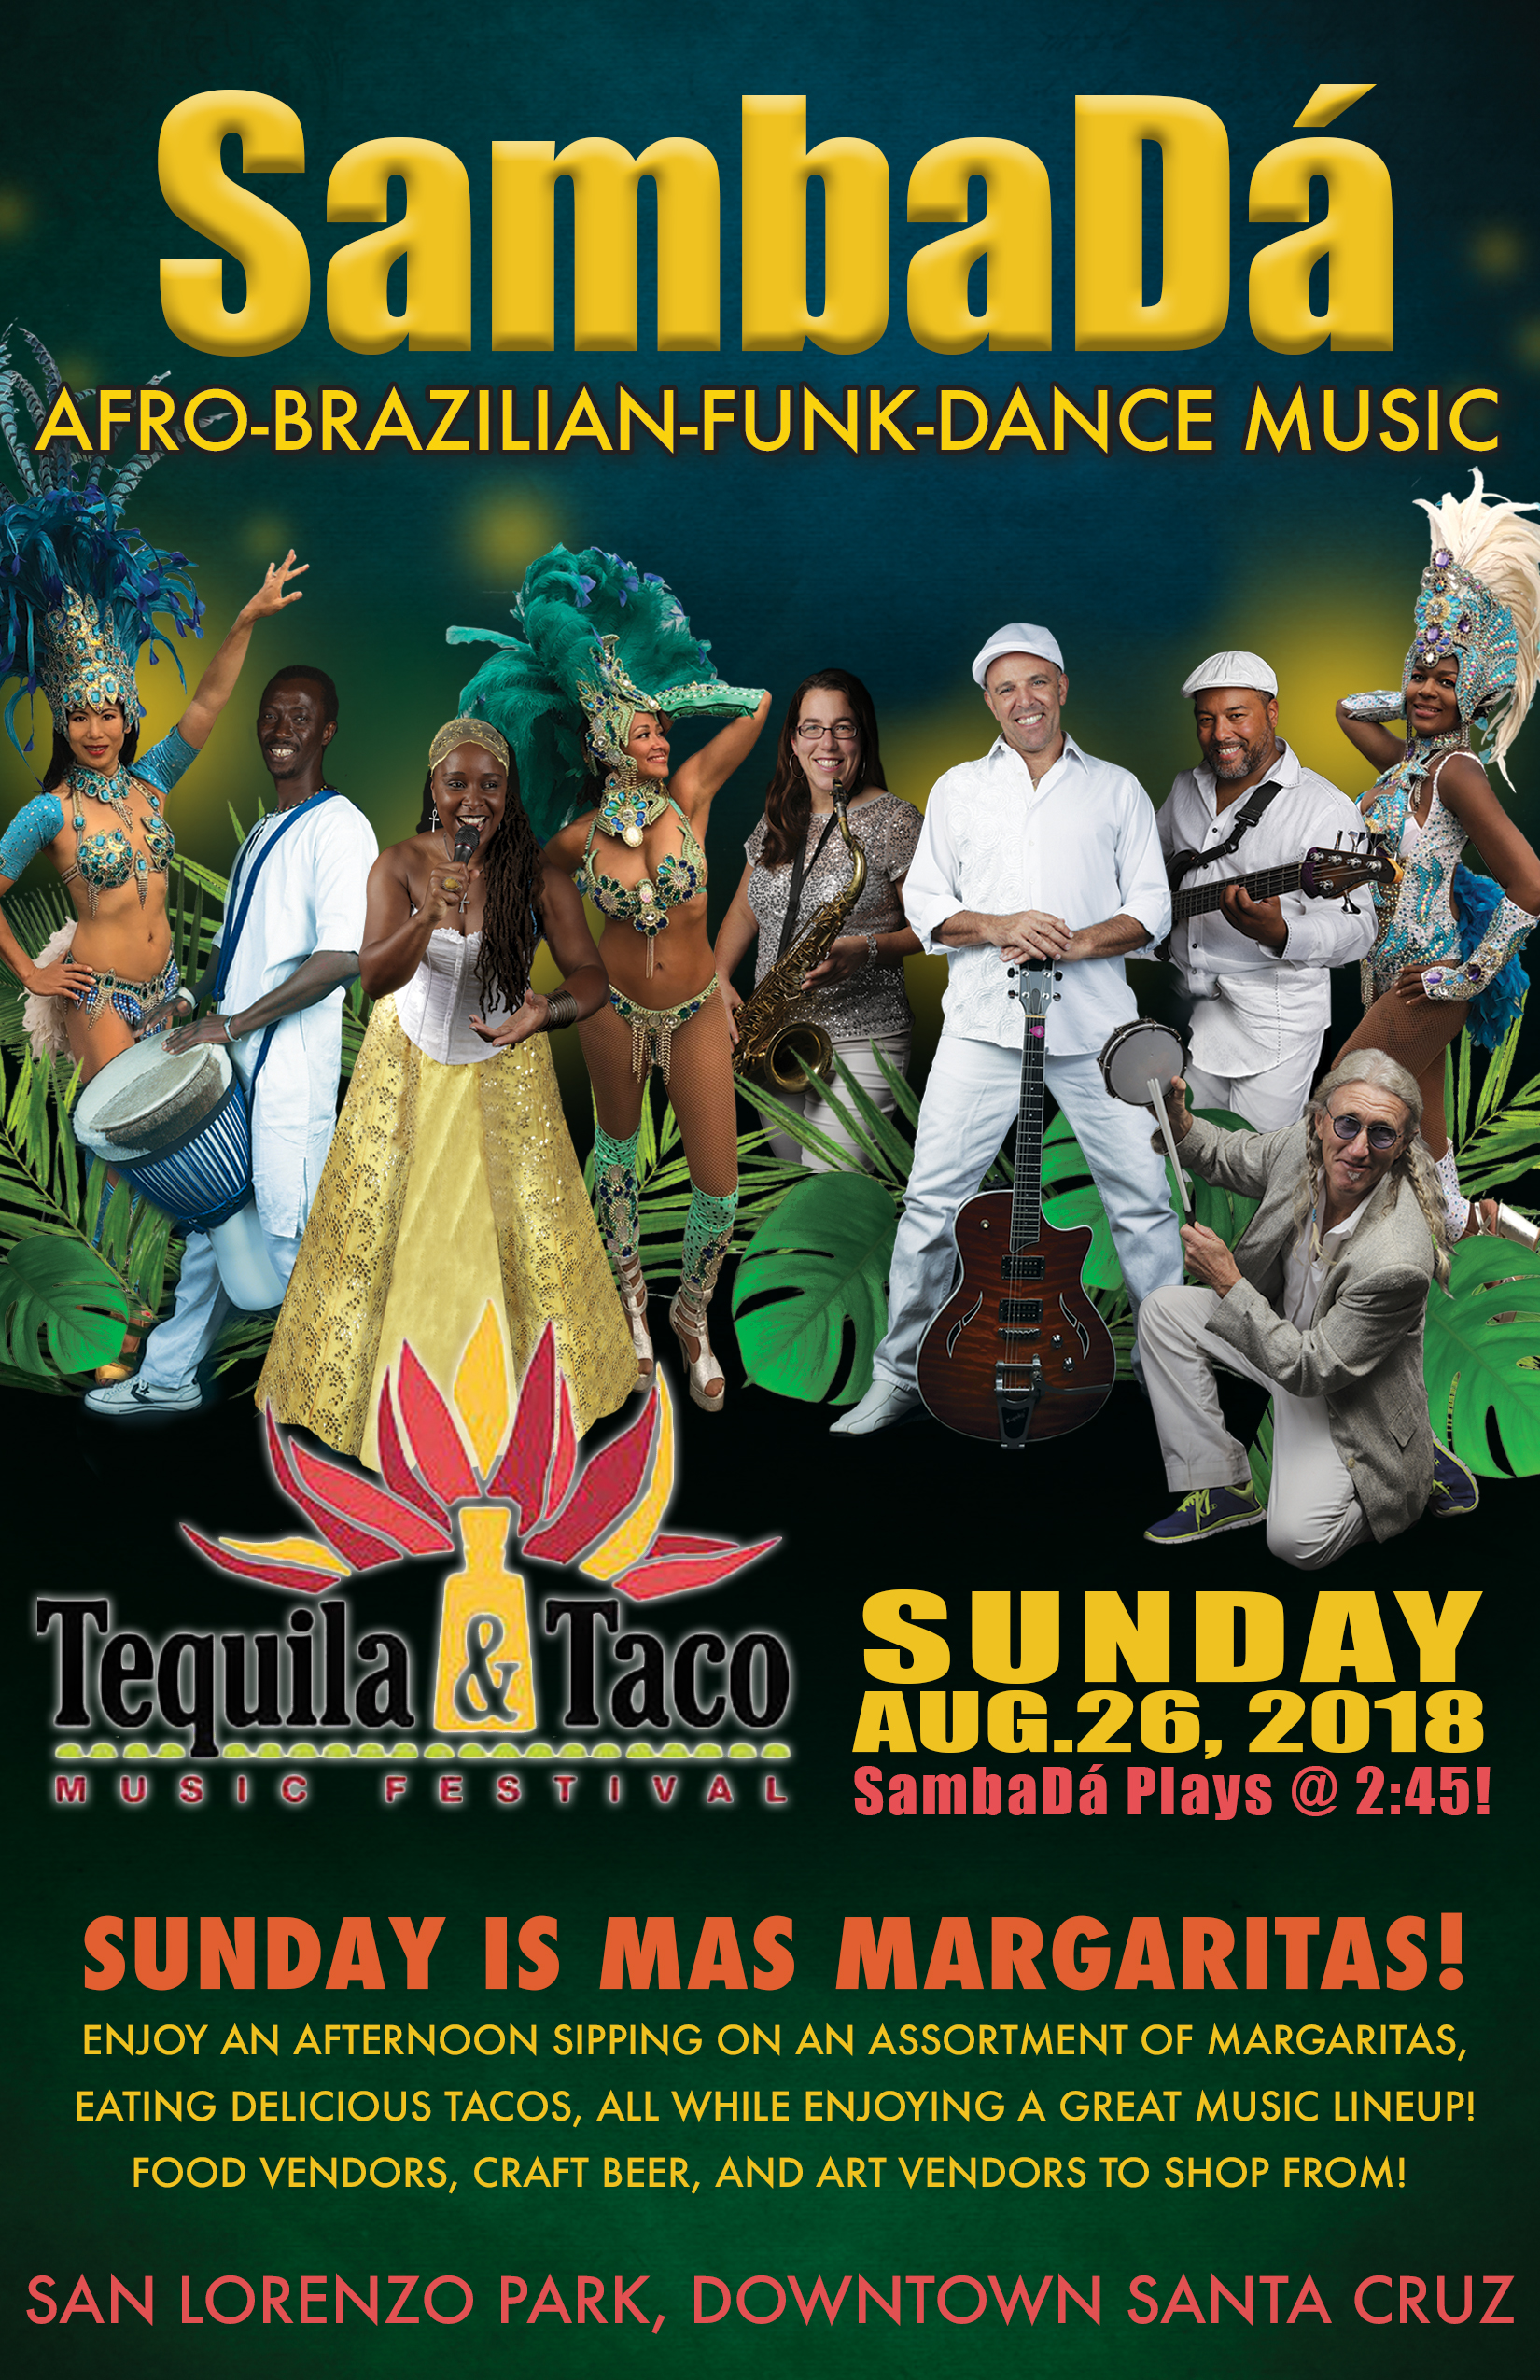 SUN.AUG.26 – TEQUILA & TACO FESTIVAL – SANTA CRUZ, CA